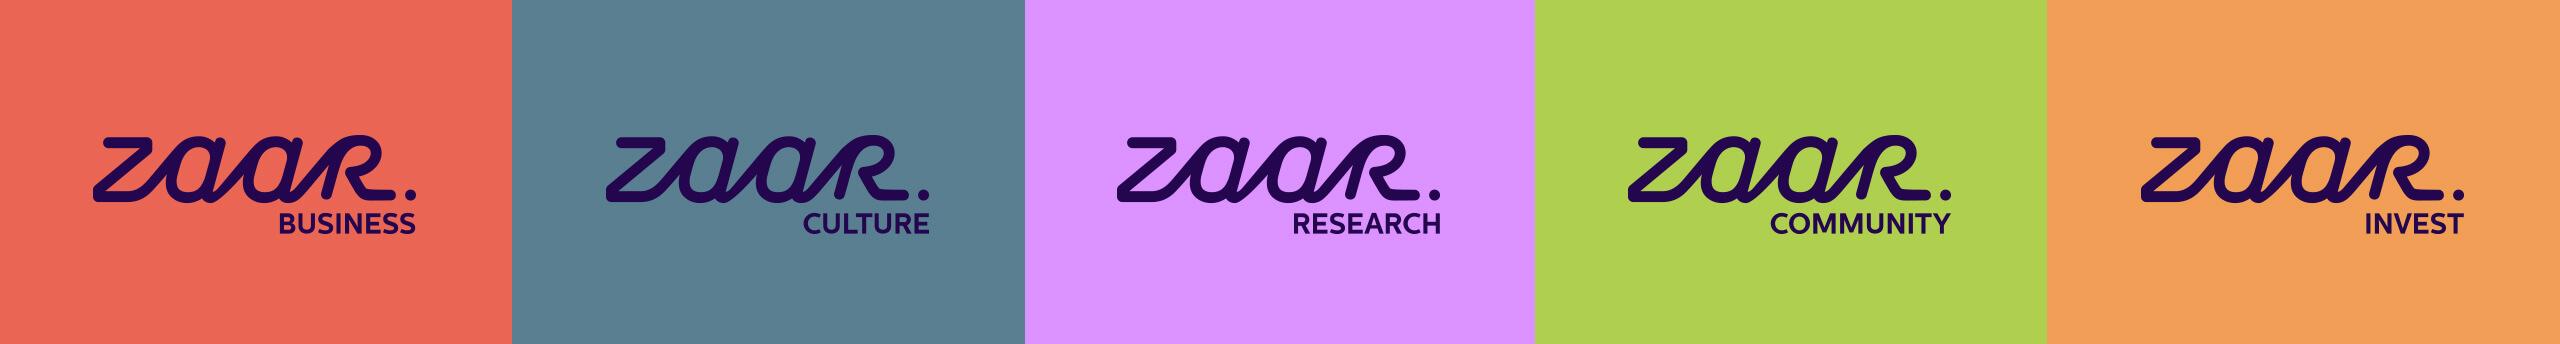 The-Concept-Stadium-Zaar-Behance-01_03 case study